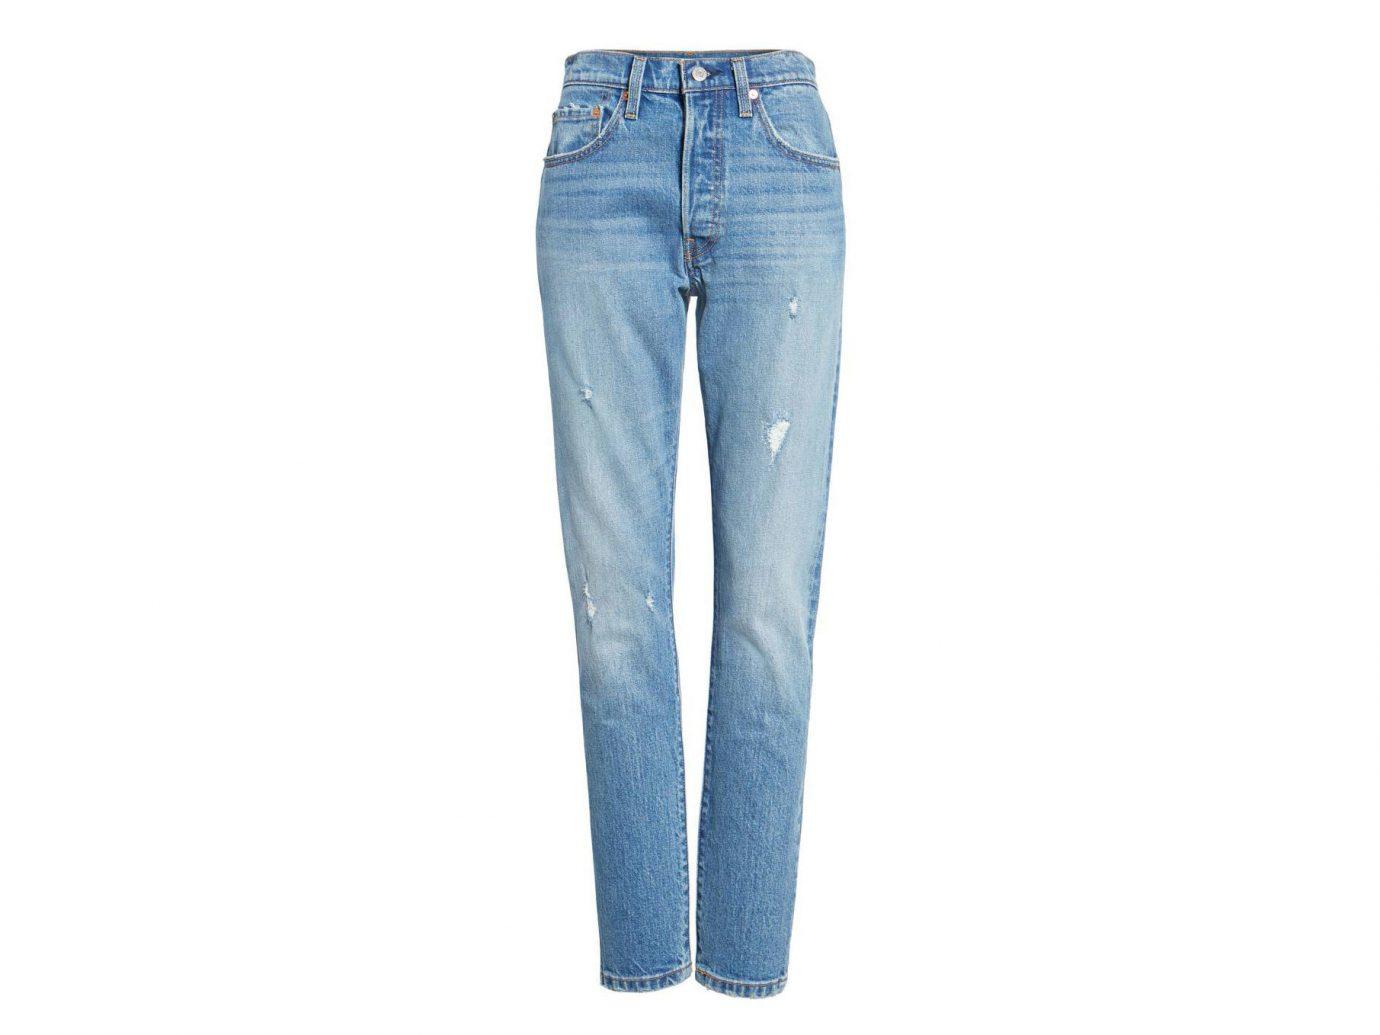 Celebs Style + Design Travel Shop clothing trouser jeans denim pocket trousers waist electric blue blue colored